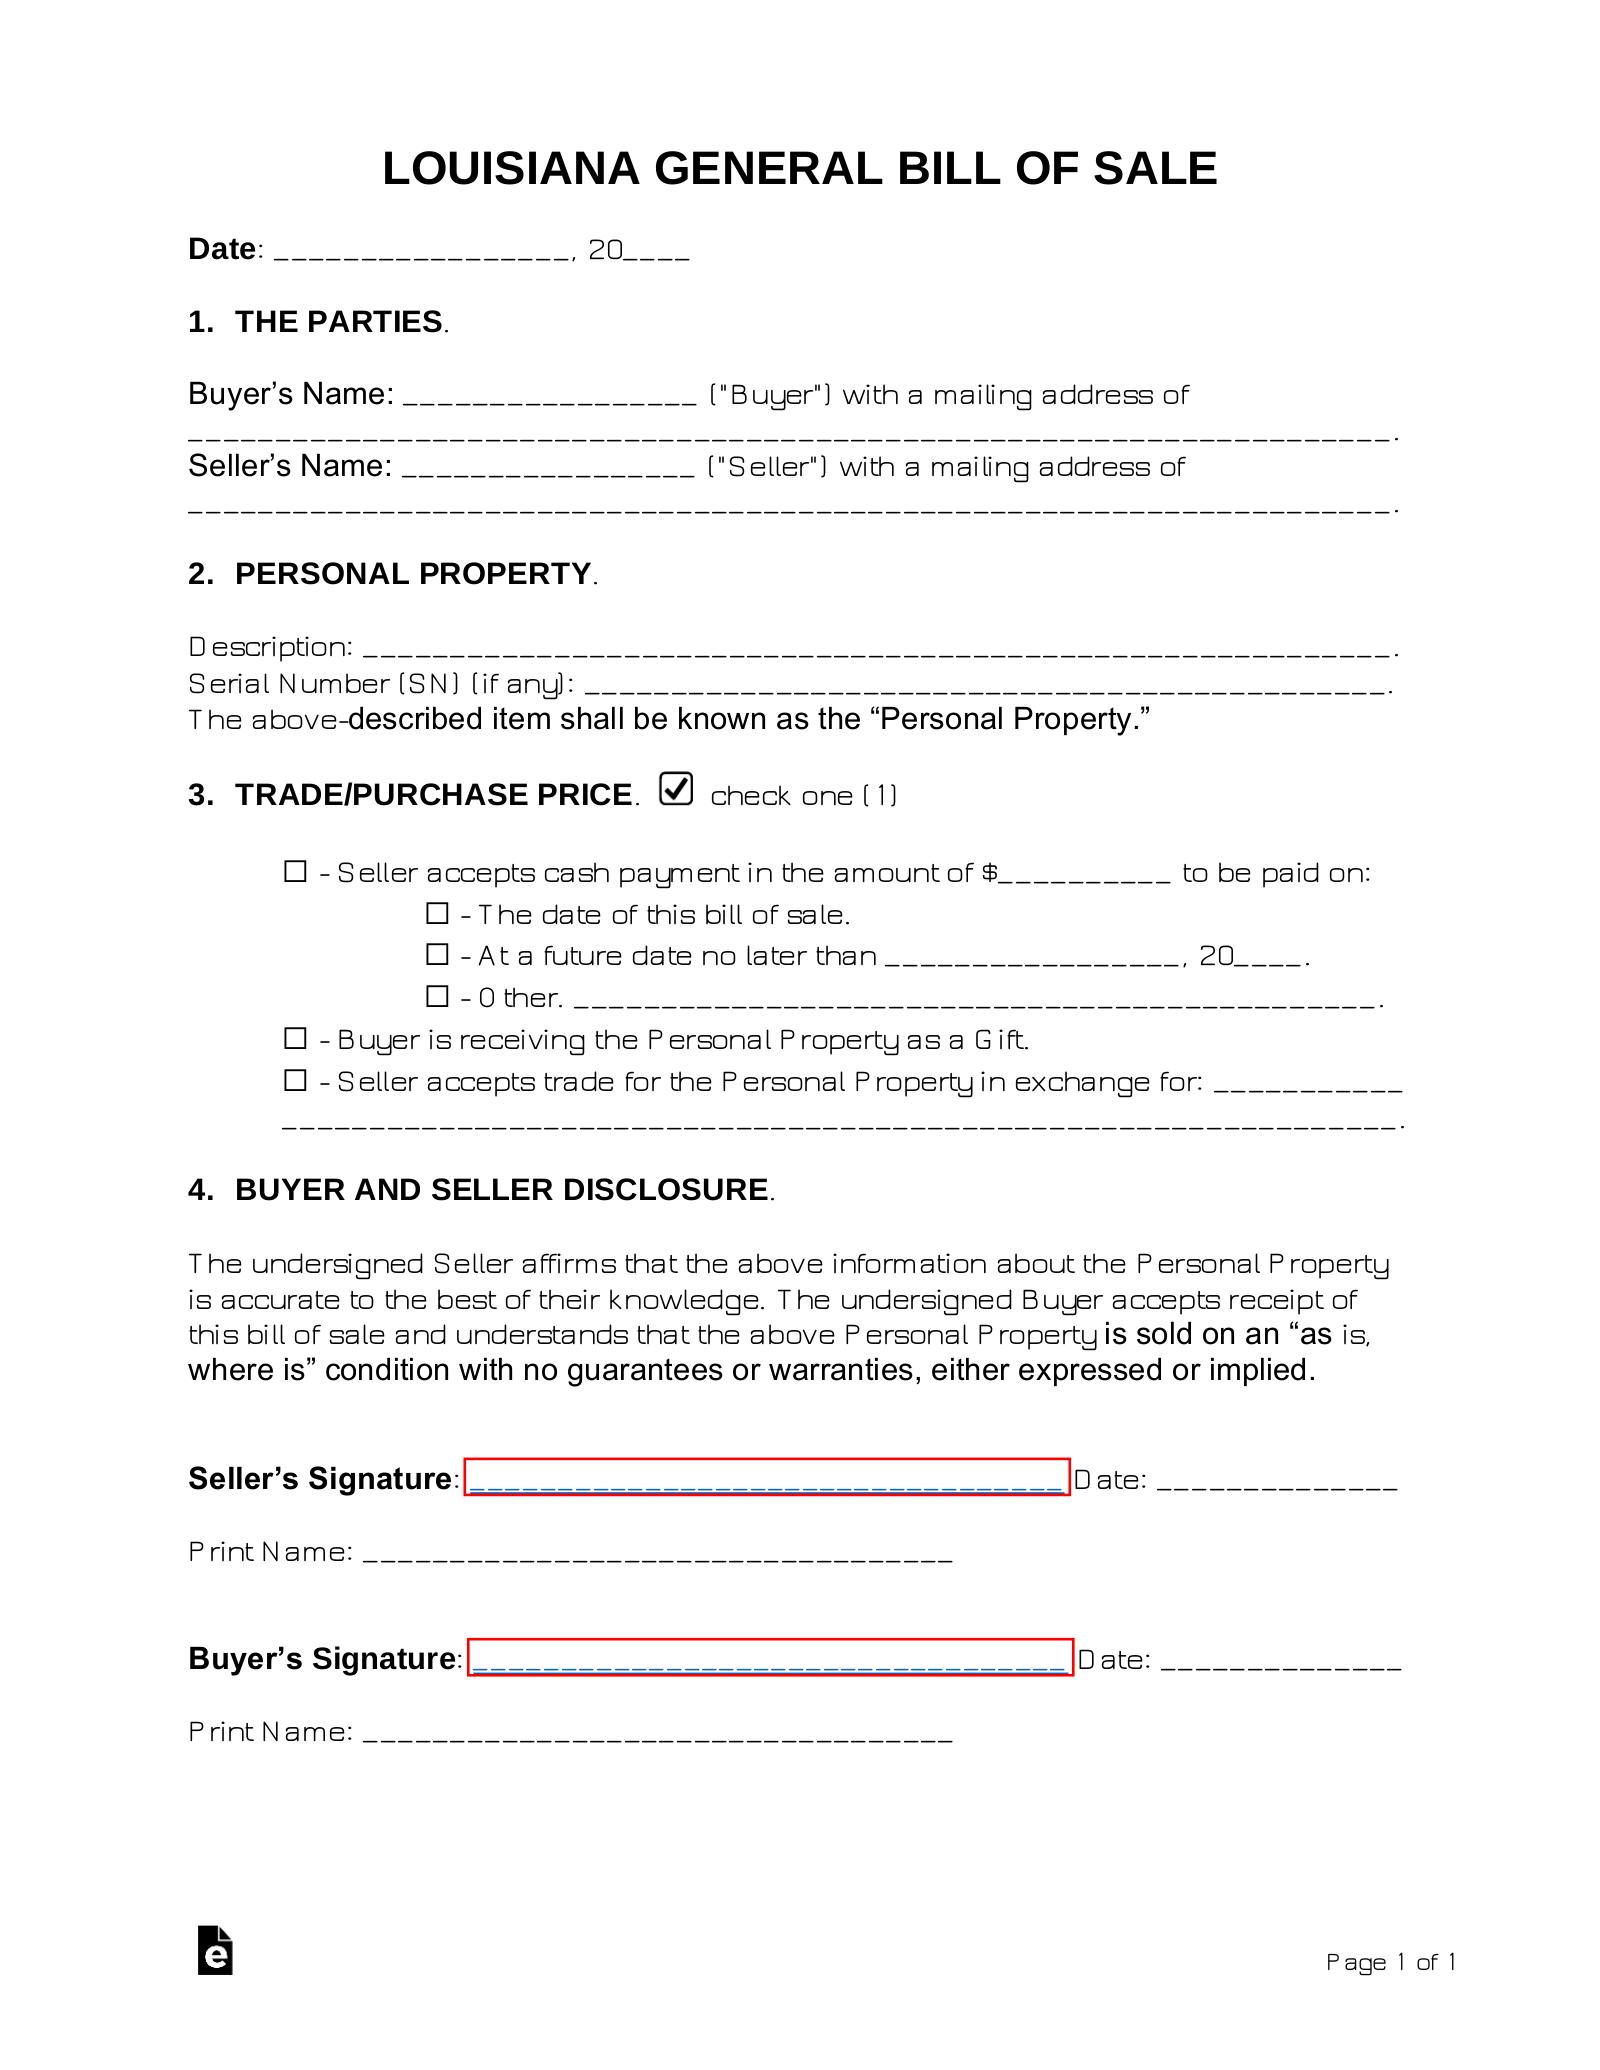 Free Louisiana General Bill Of Sale Form